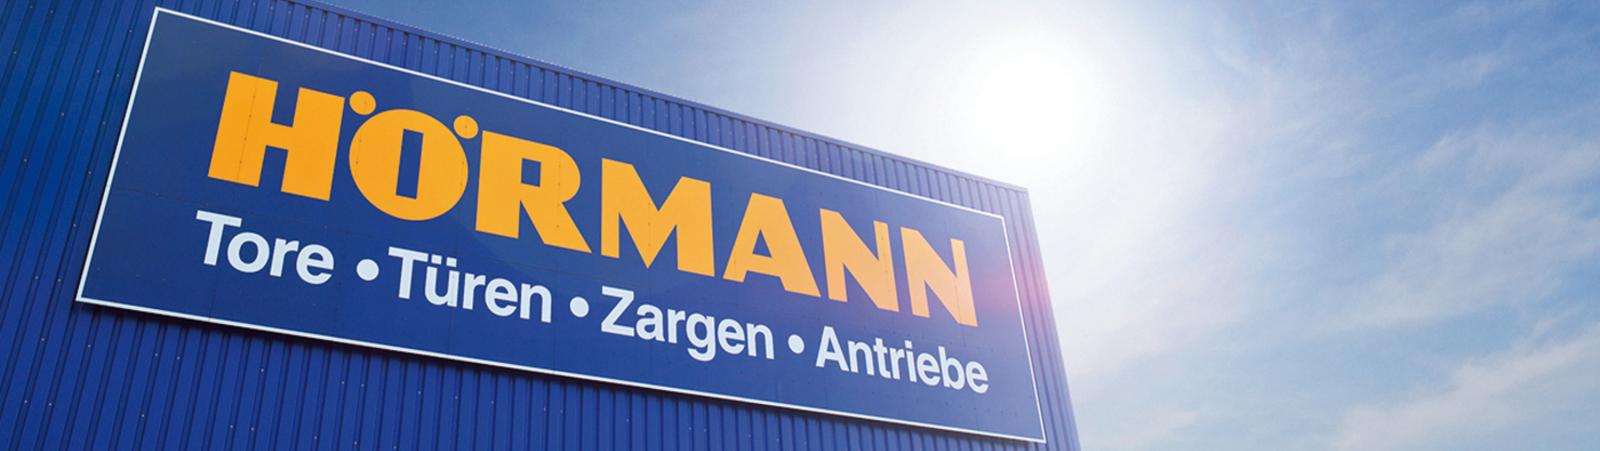 hoermann_Himmel_teaser_1600x451